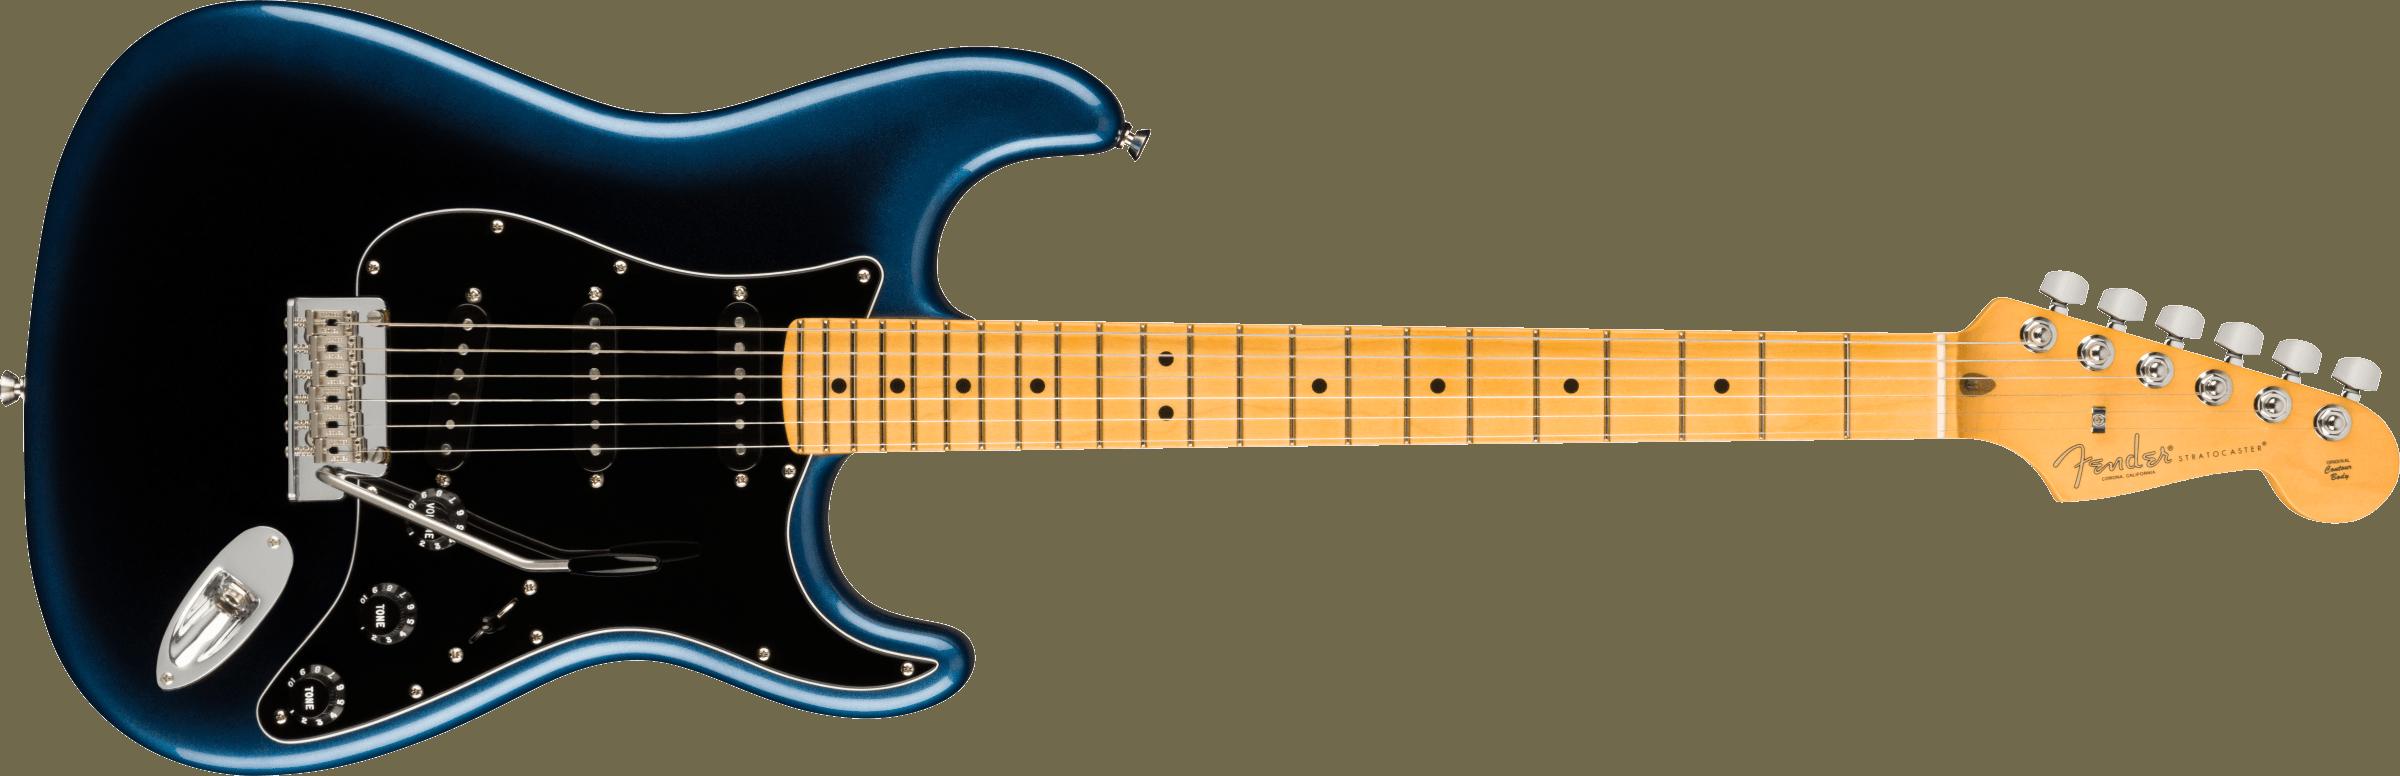 FENDER-American-Professional-II-Stratocaster-Maple-Fingerboard-Dark-Night-sku-571005530